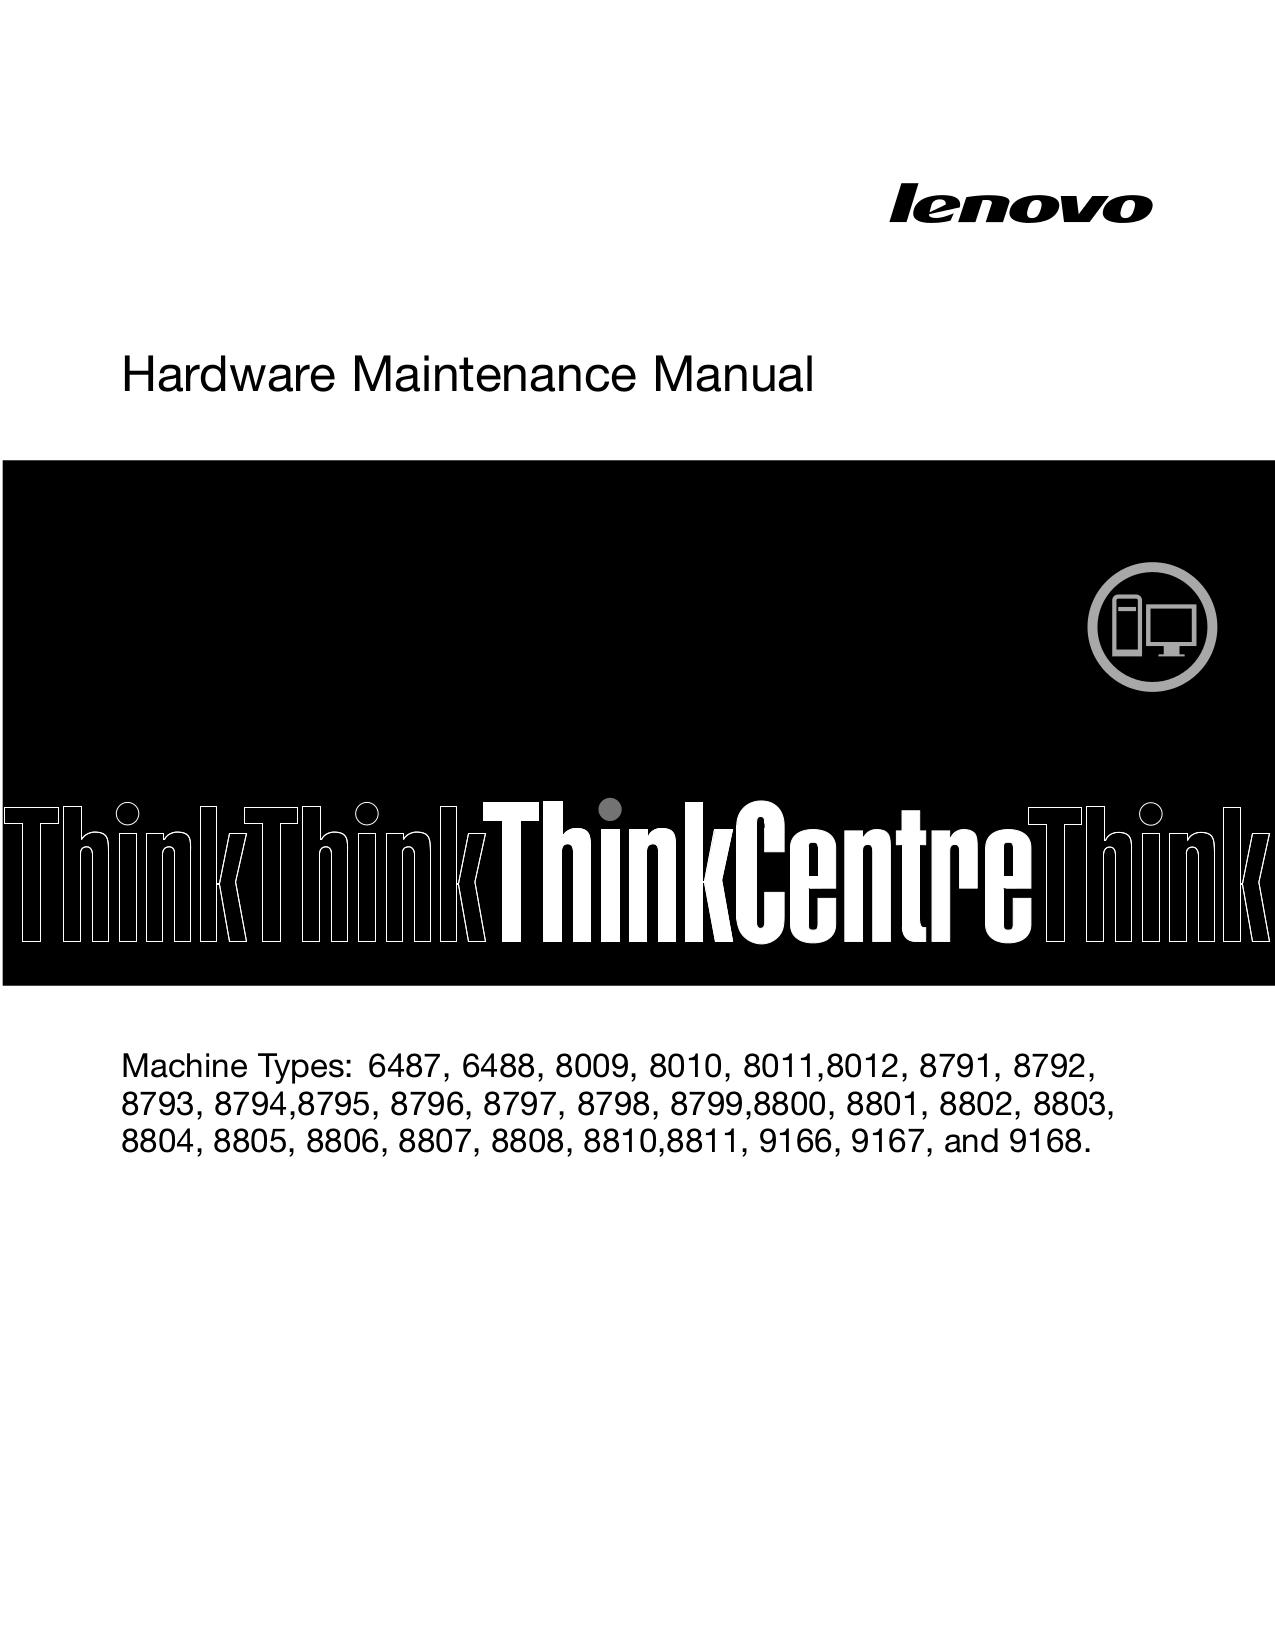 pdf for Lenovo Desktop ThinkCentre M55p 6488 manual